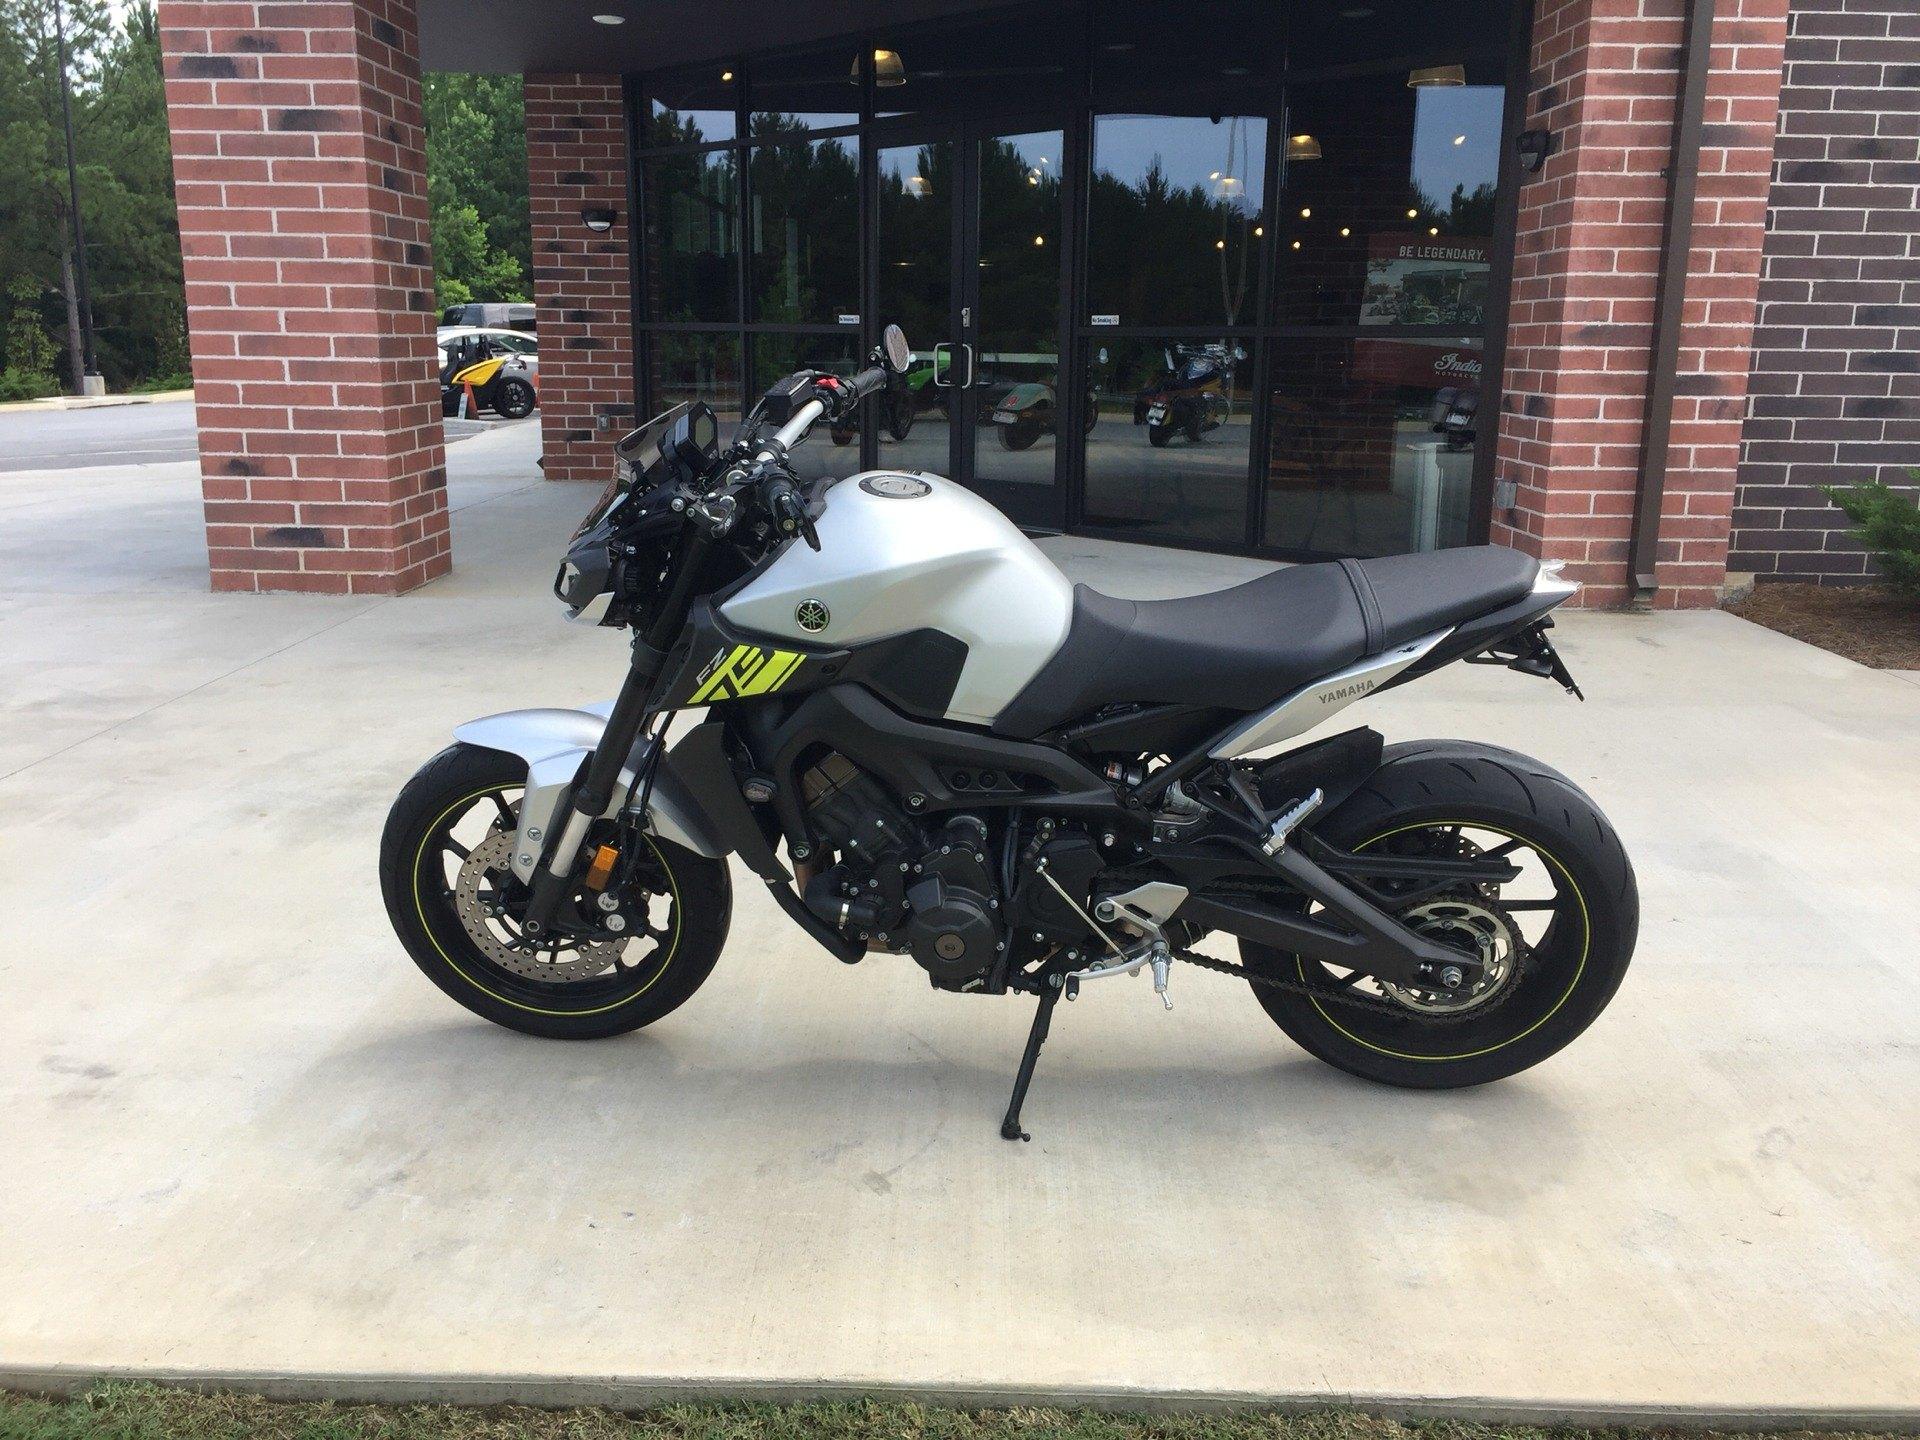 Yamaha Fz Series